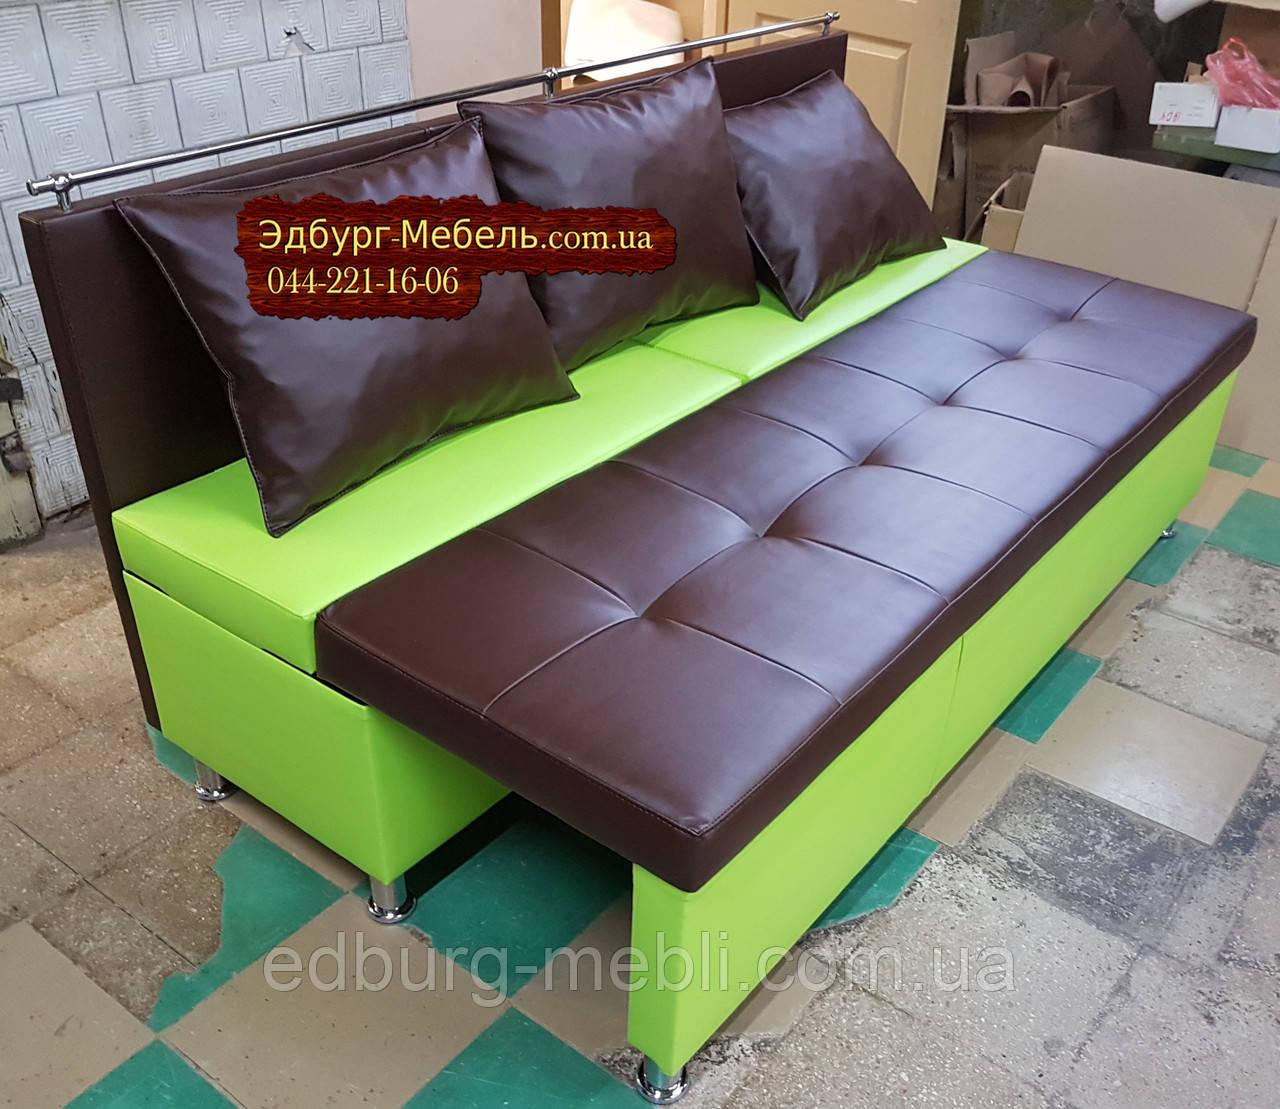 Диван для узкой кухни, коридора с ящиком + спальным местом 1800х600х850мм - фото 2